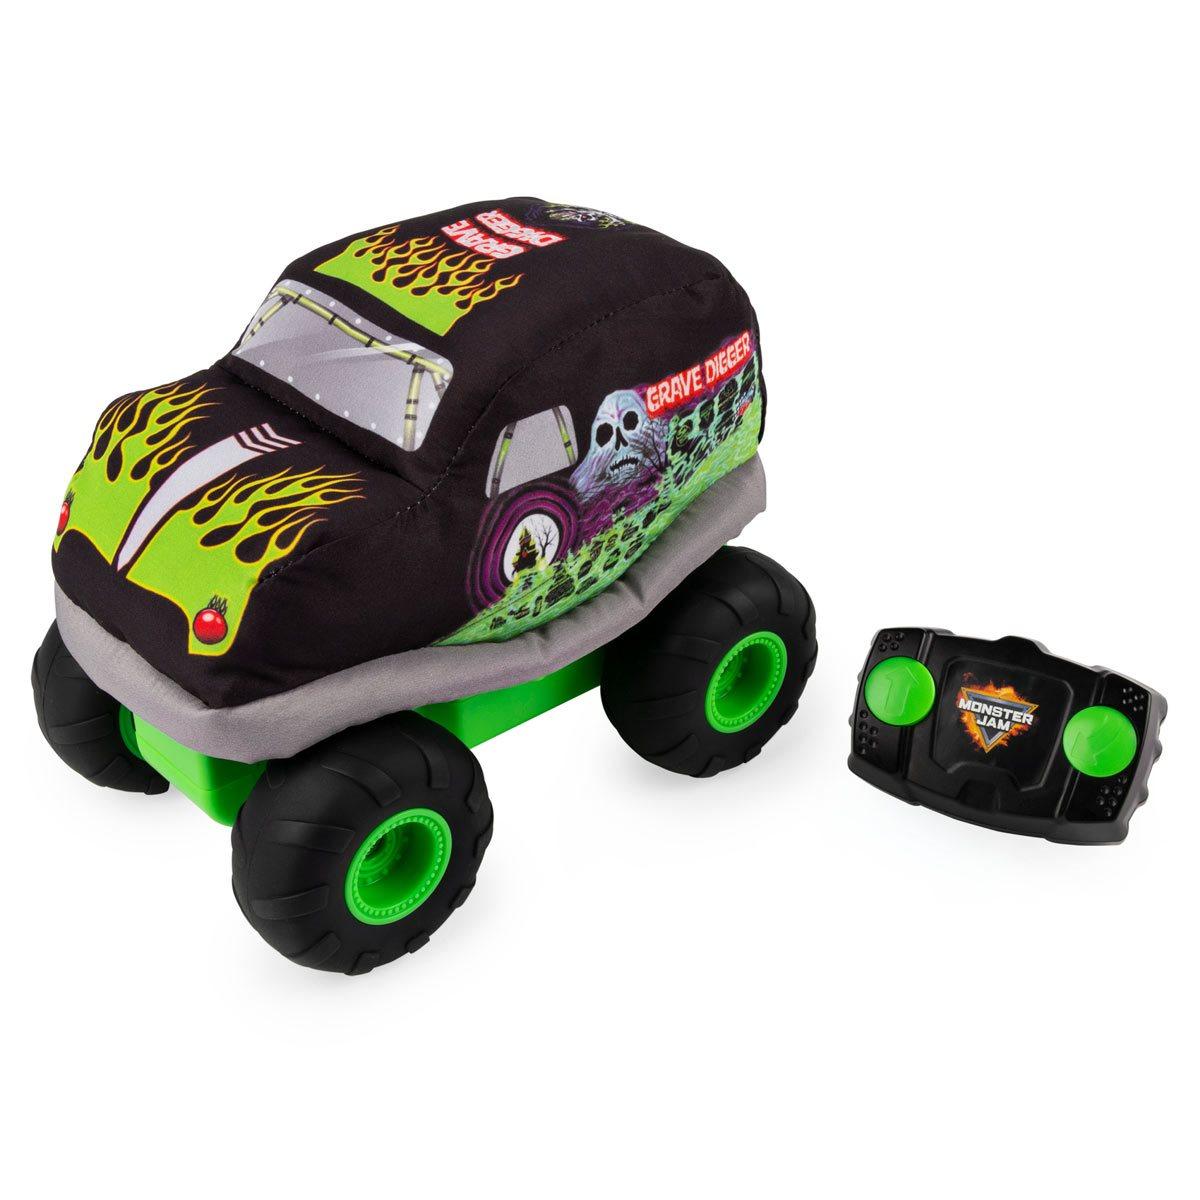 Monster Jam Grave Digger Plush Remote Control Soft Body Monster Truck